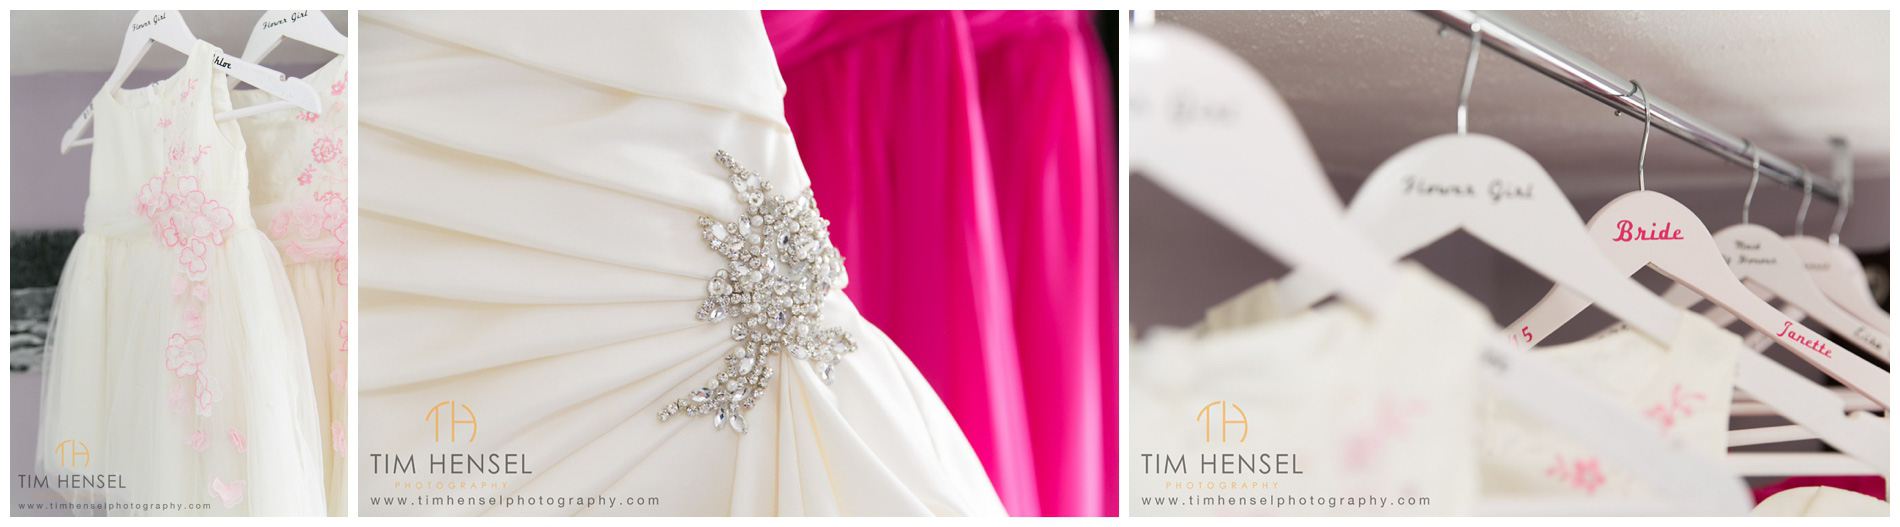 Wedding dress photographs, in Stockport